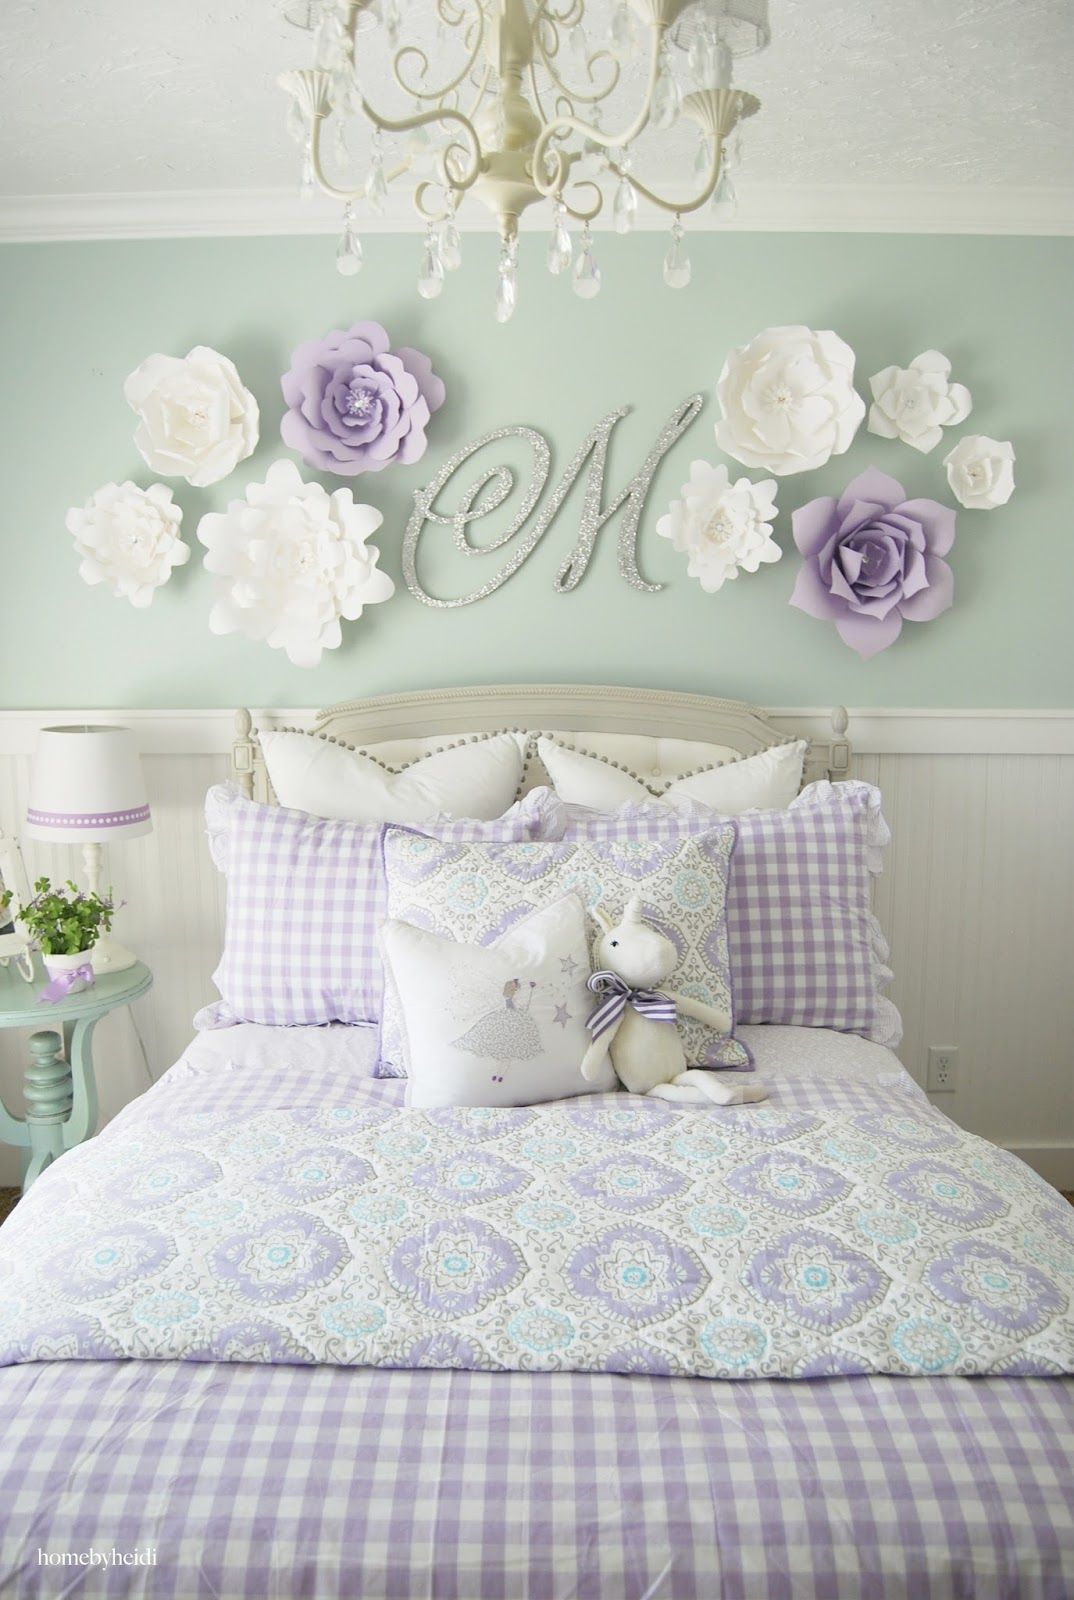 Unique Bedroom Decor Ideas You Haven T Seen Before Decoracion De